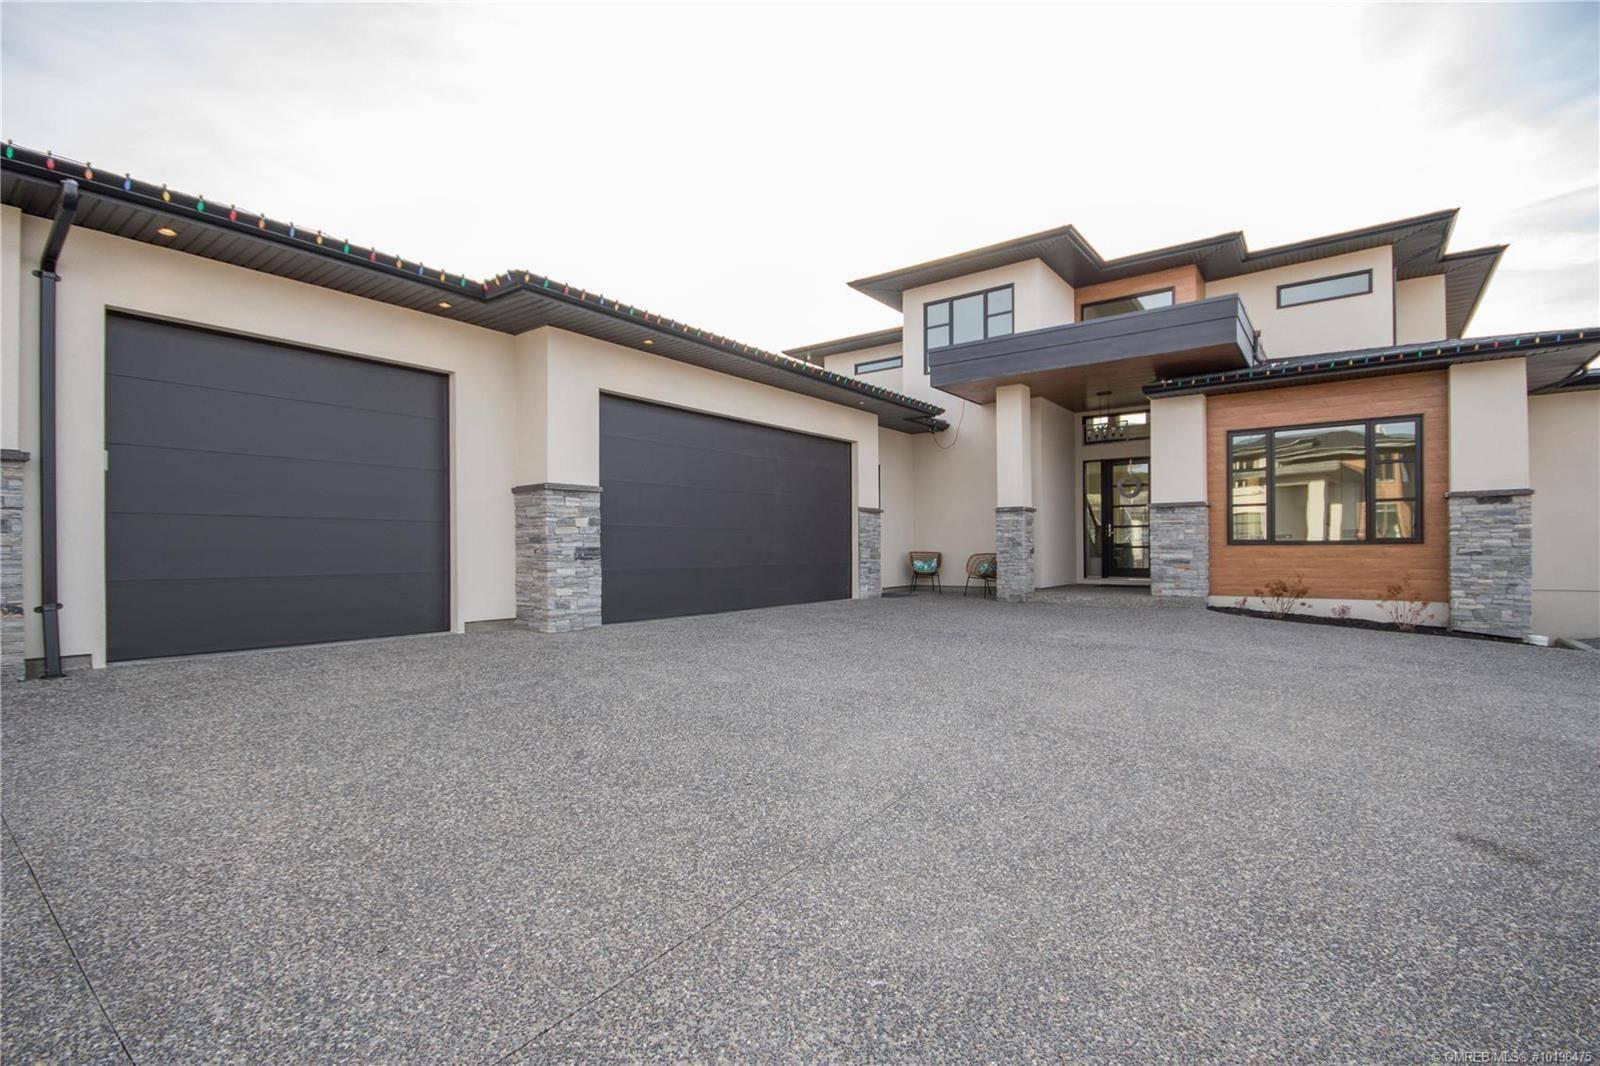 House for sale at 1635 Vincent Pl Kelowna British Columbia - MLS: 10196475